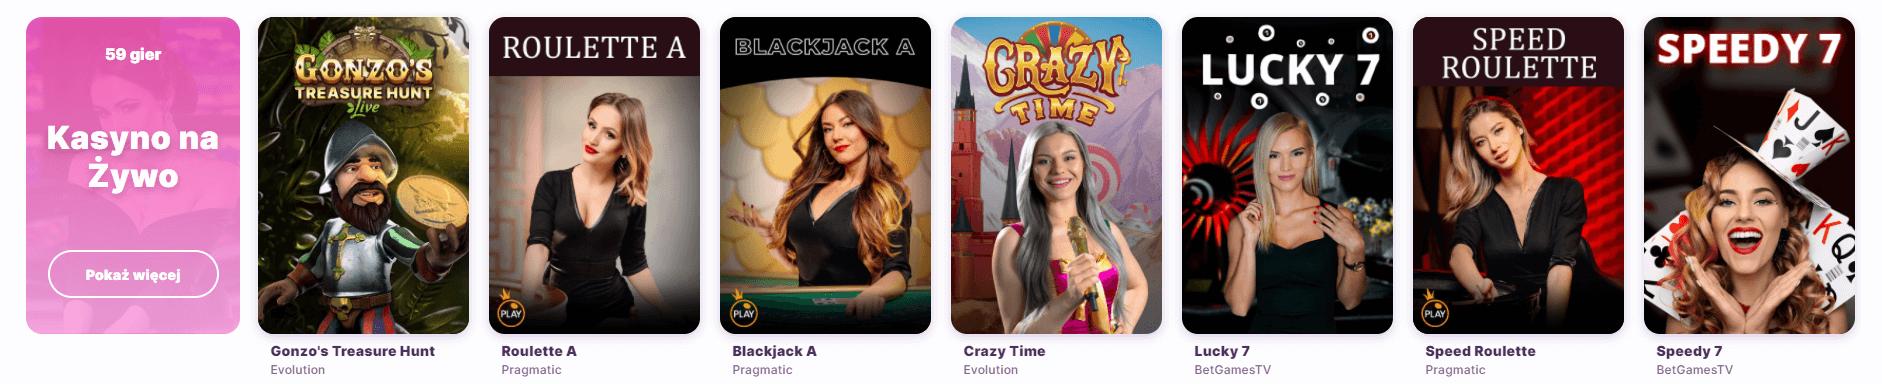 nomini kasyno na żywo screenshot